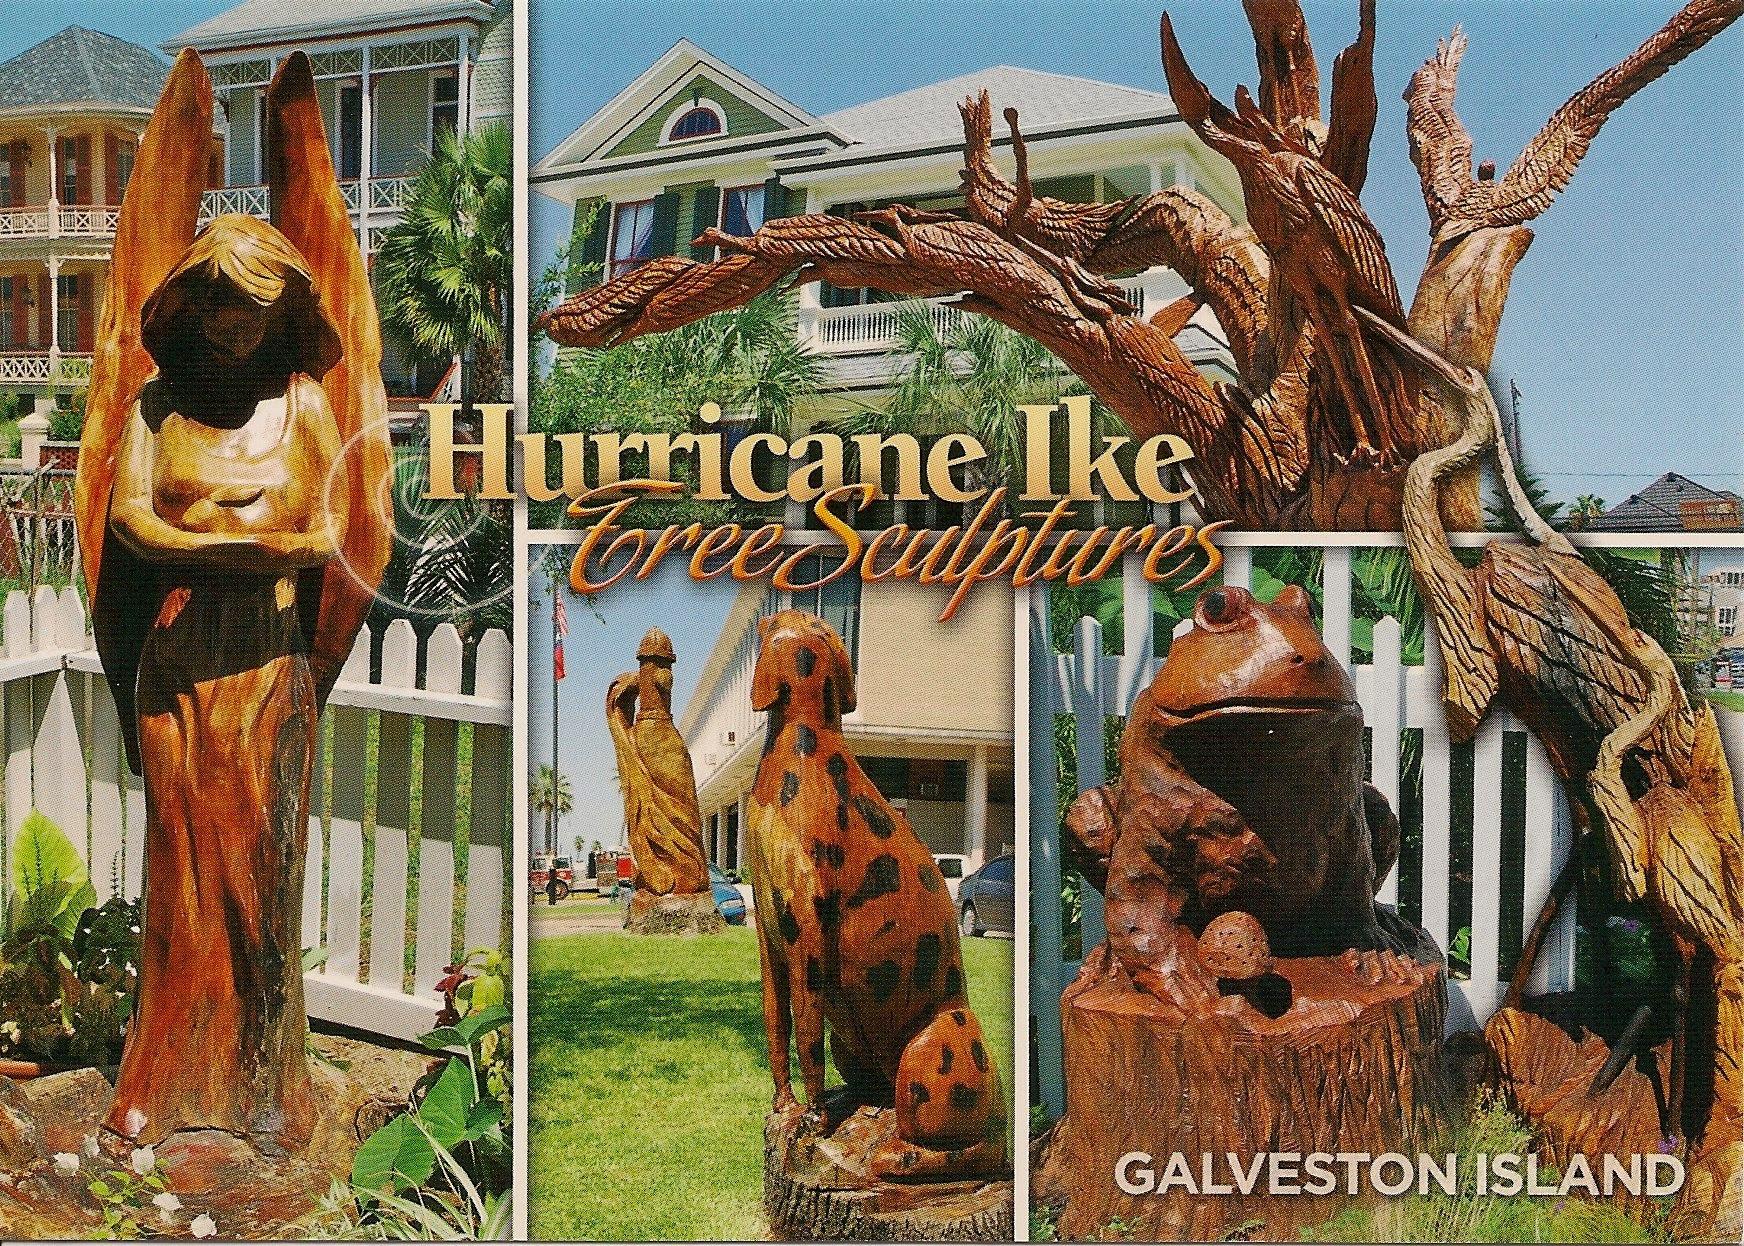 Hurricane Ike Tree Sculptures